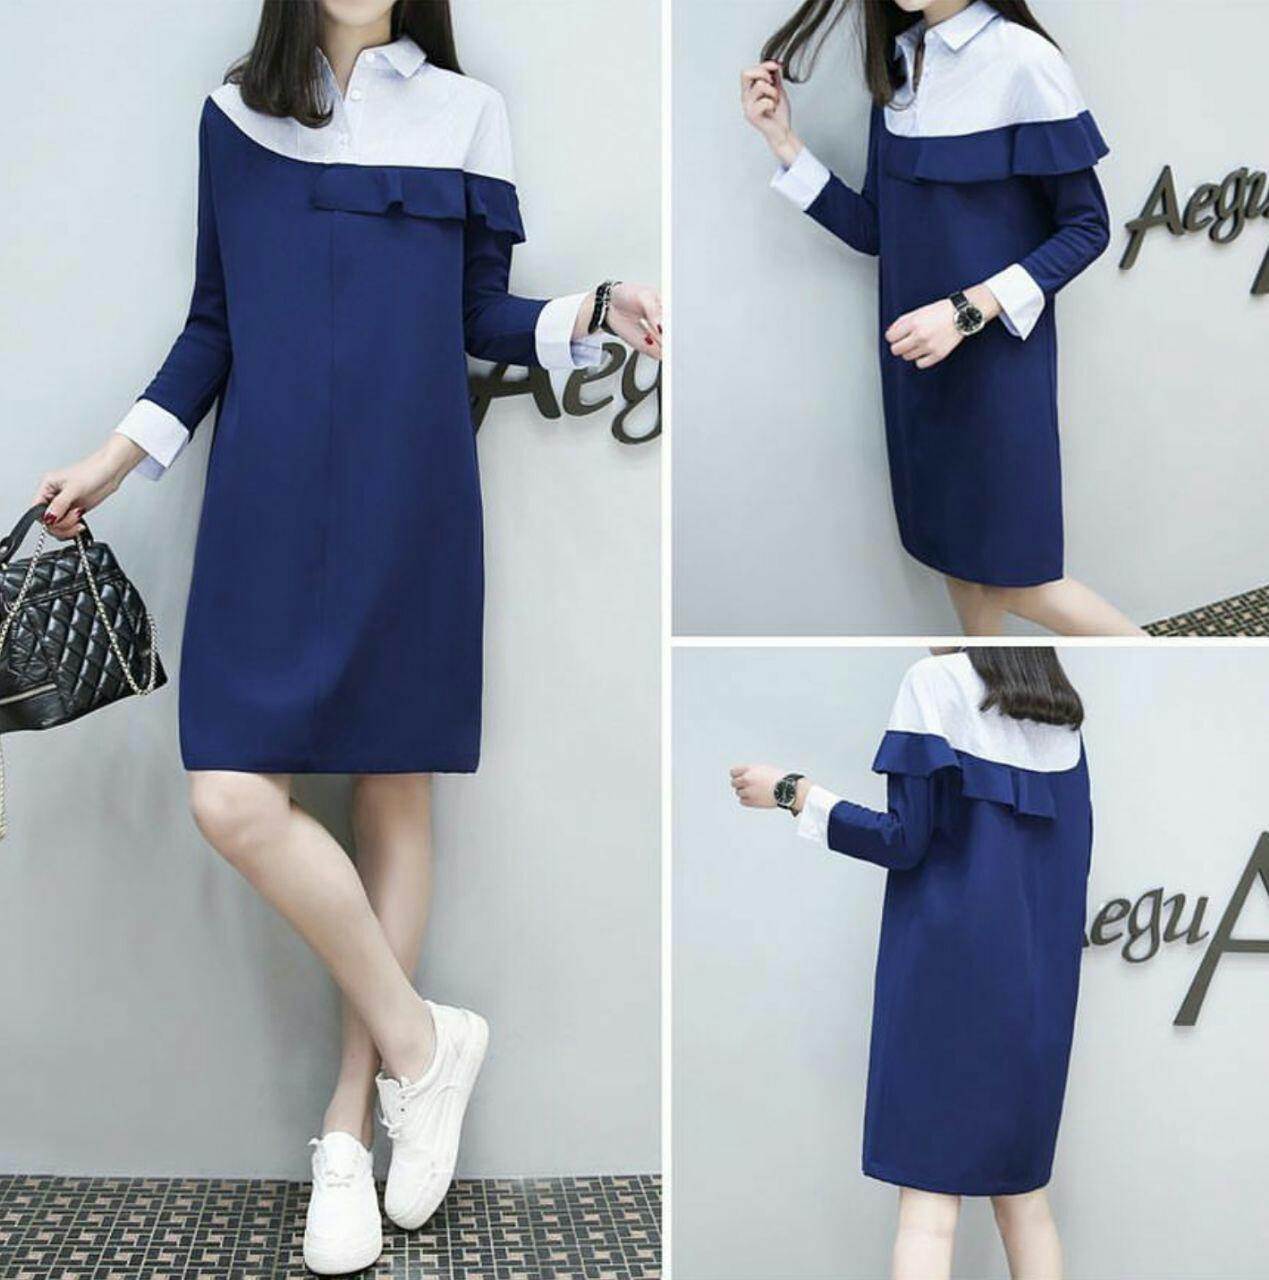 FJCO Dress Ruffle / Dress wanita / Fashion wanita